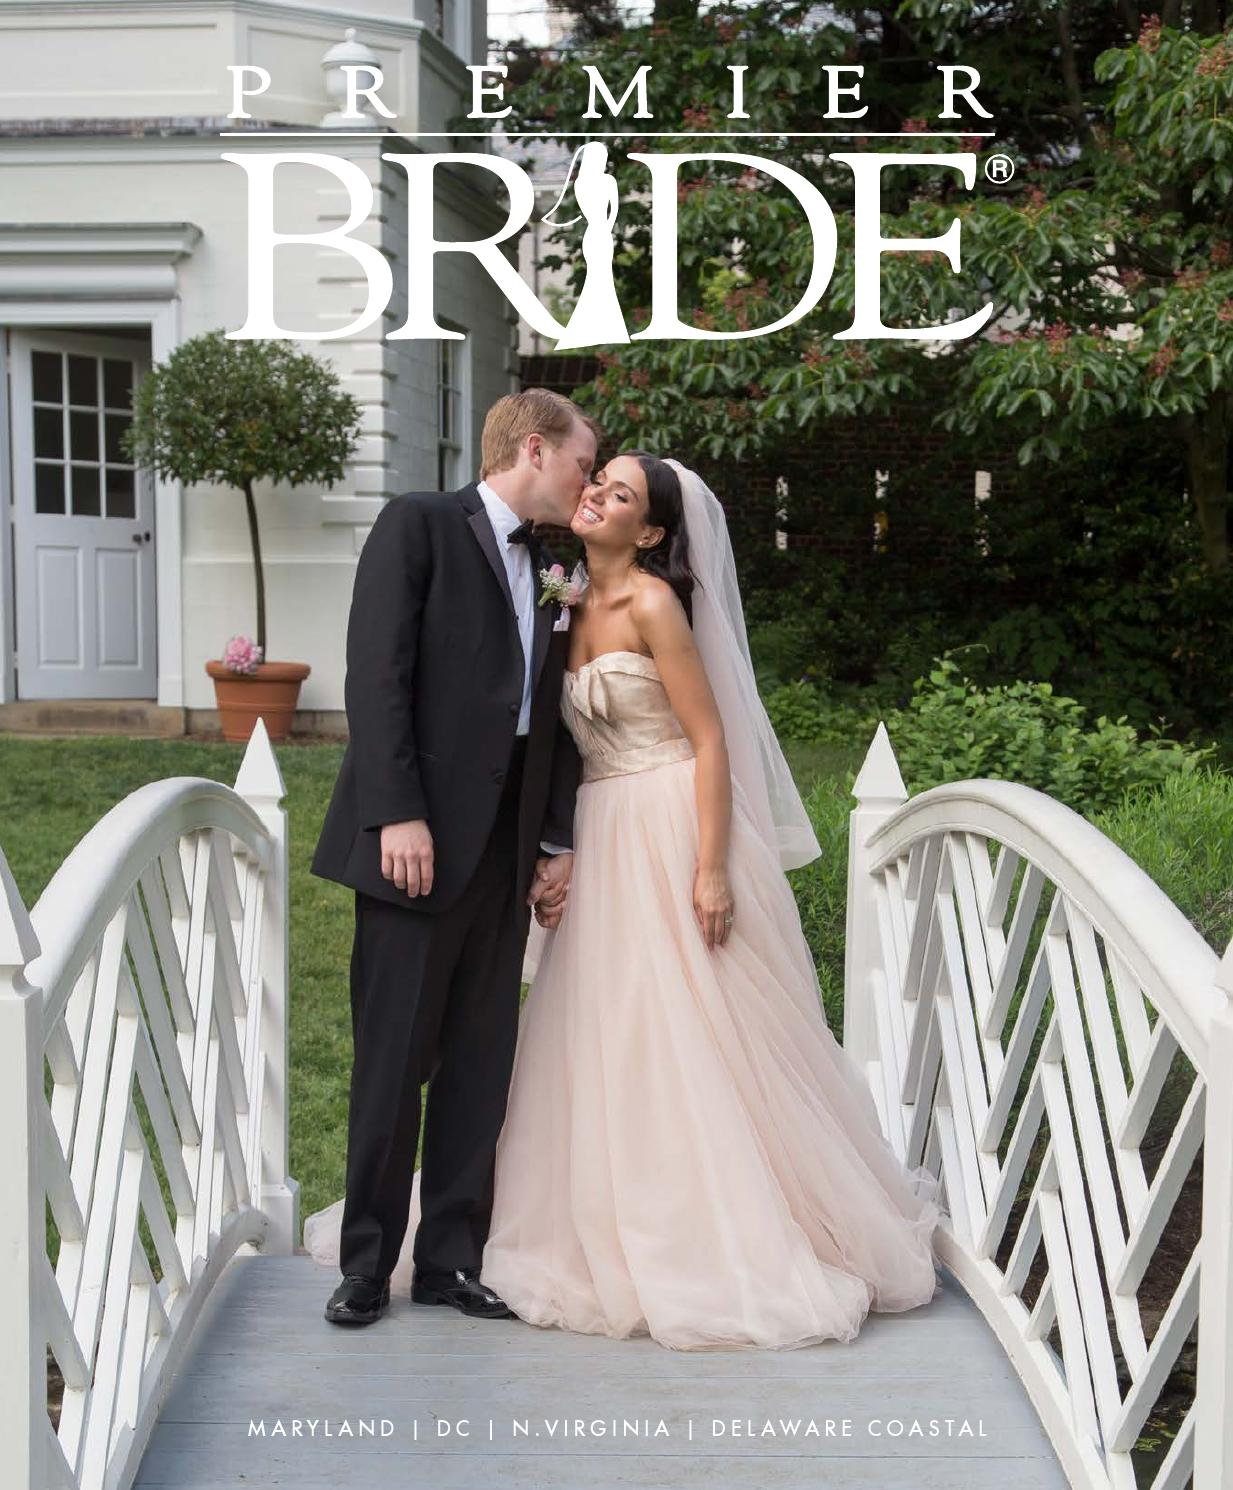 Asian brides grooms an unparalleled, pov sex virgin pics